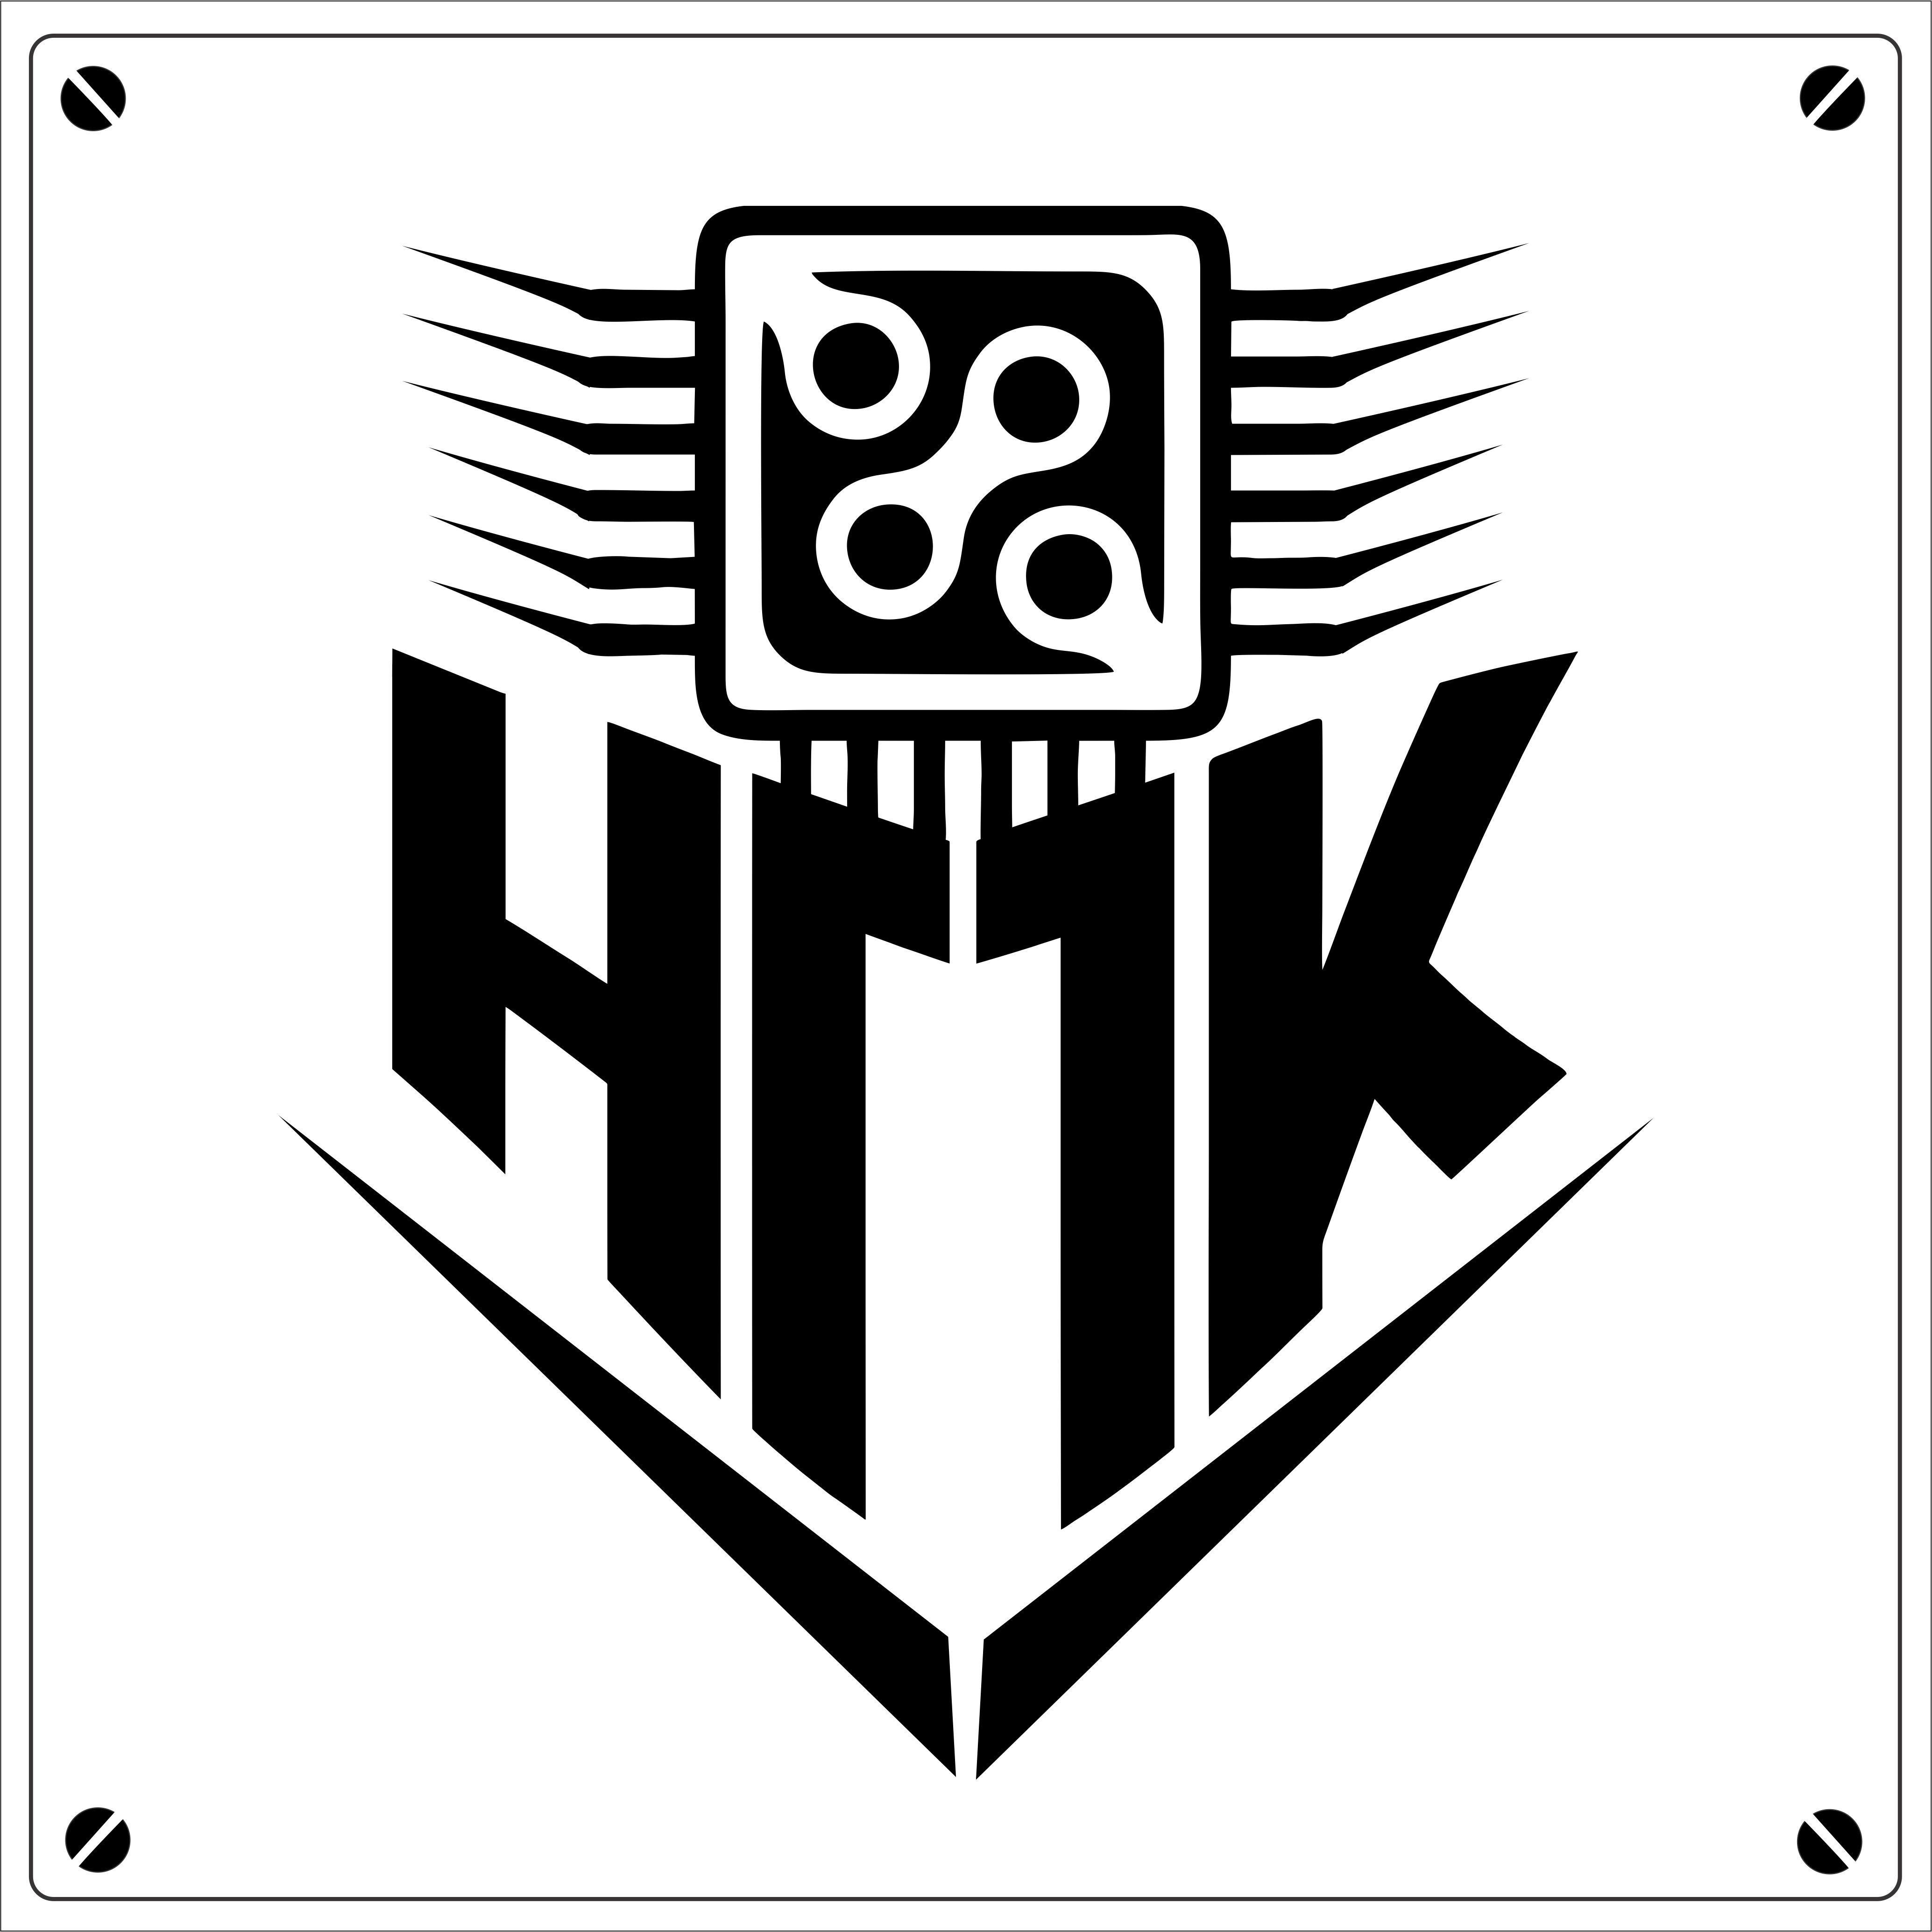 Нарисовать лого для Научно-производственной компании фото f_0575fb7fc5b6fa7f.jpg